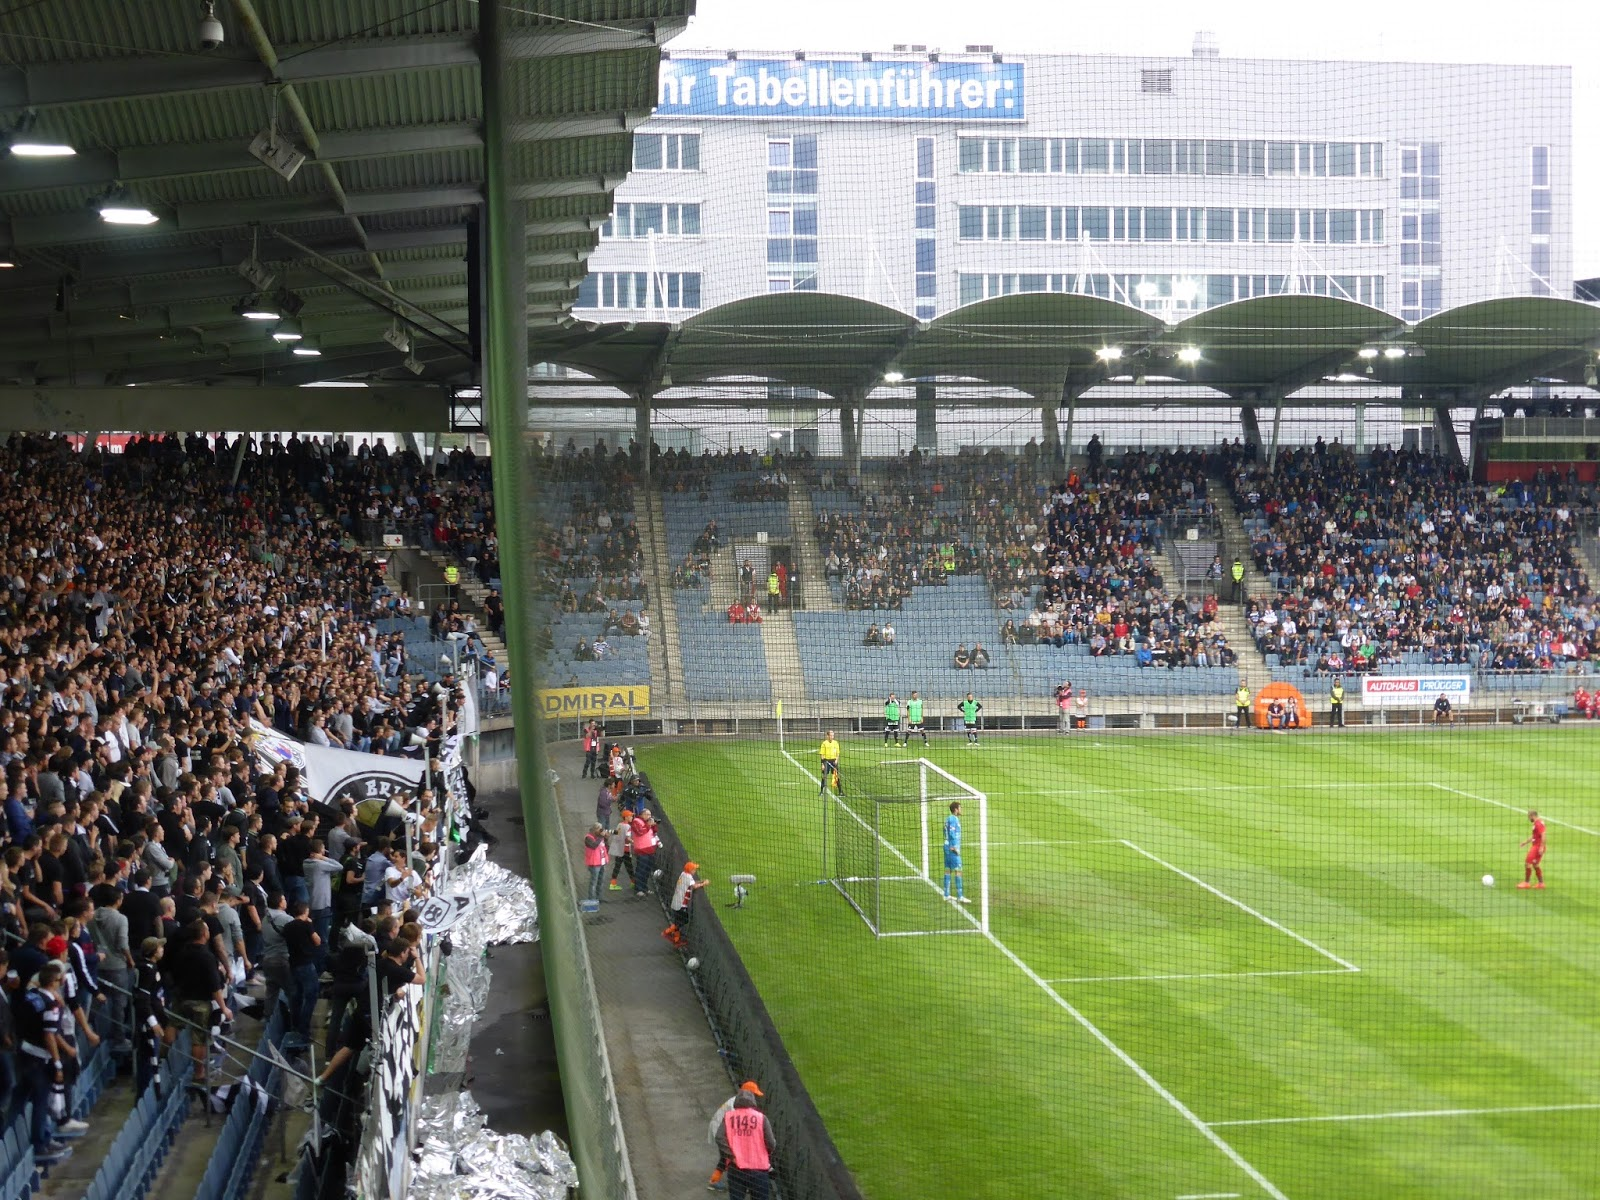 Sturm Graz Stadion